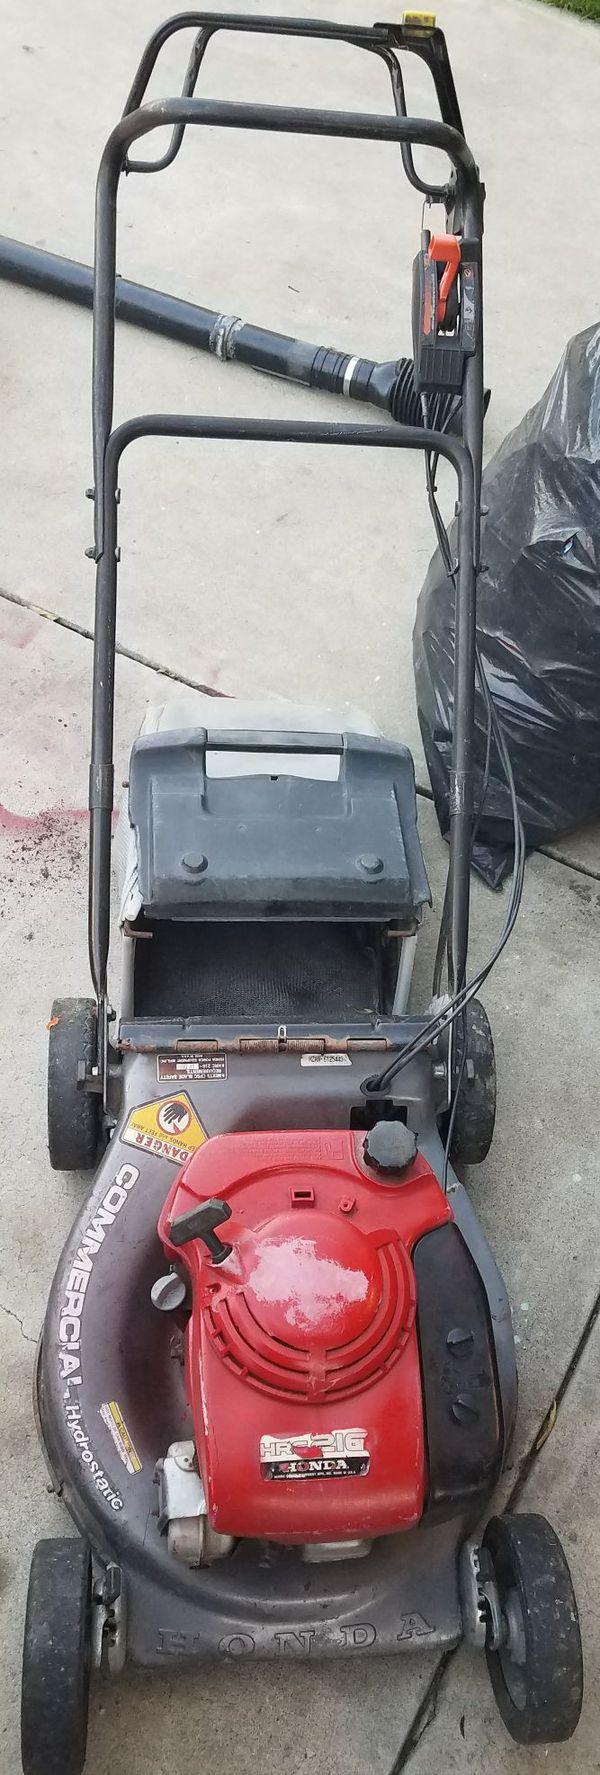 lawnmower honda commercial hrc-216 hydrostatic (tools & machinery